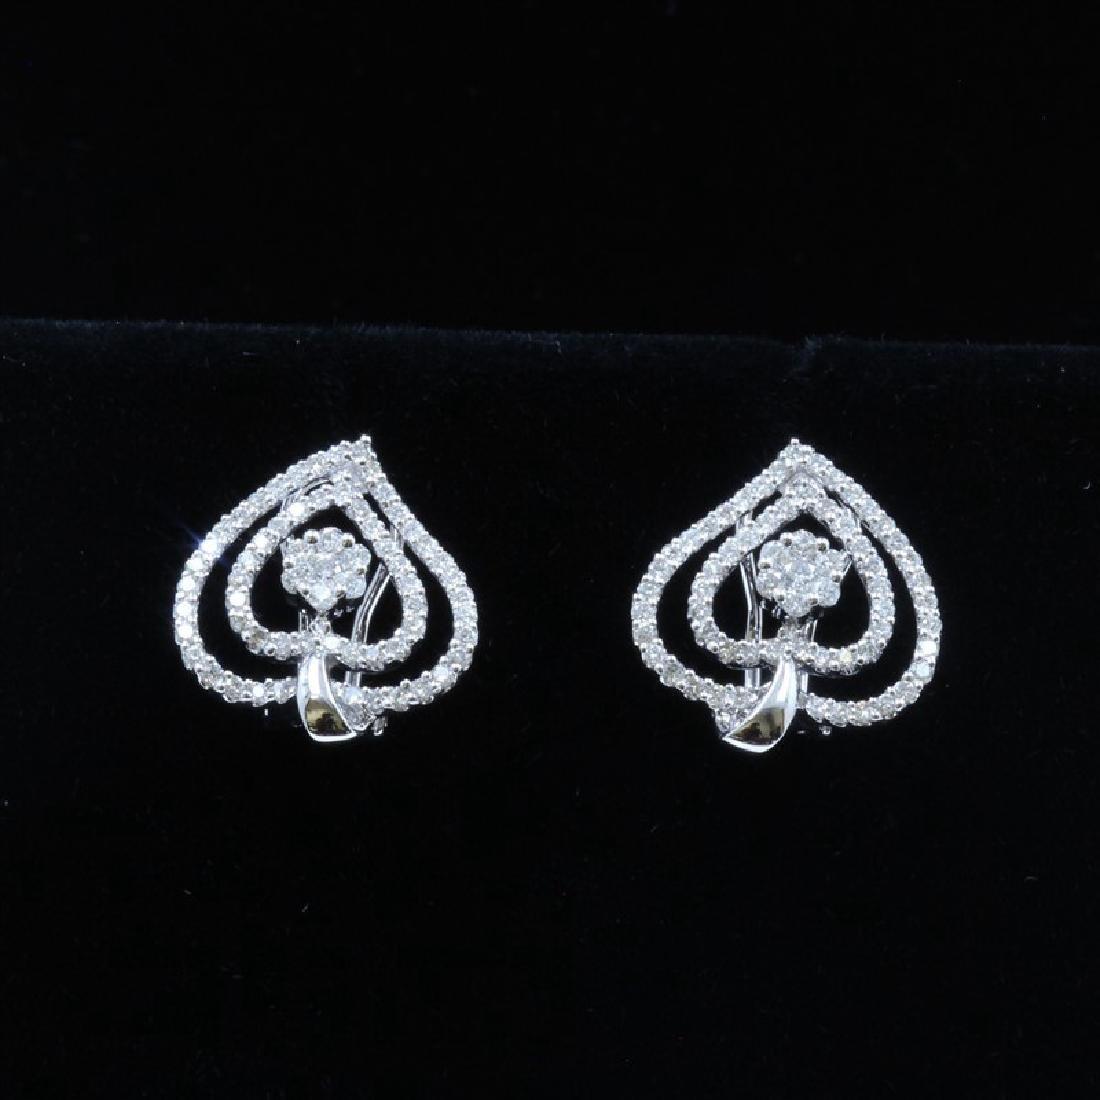 18k White Gold And Diamond Earring Round Shape Diamond-